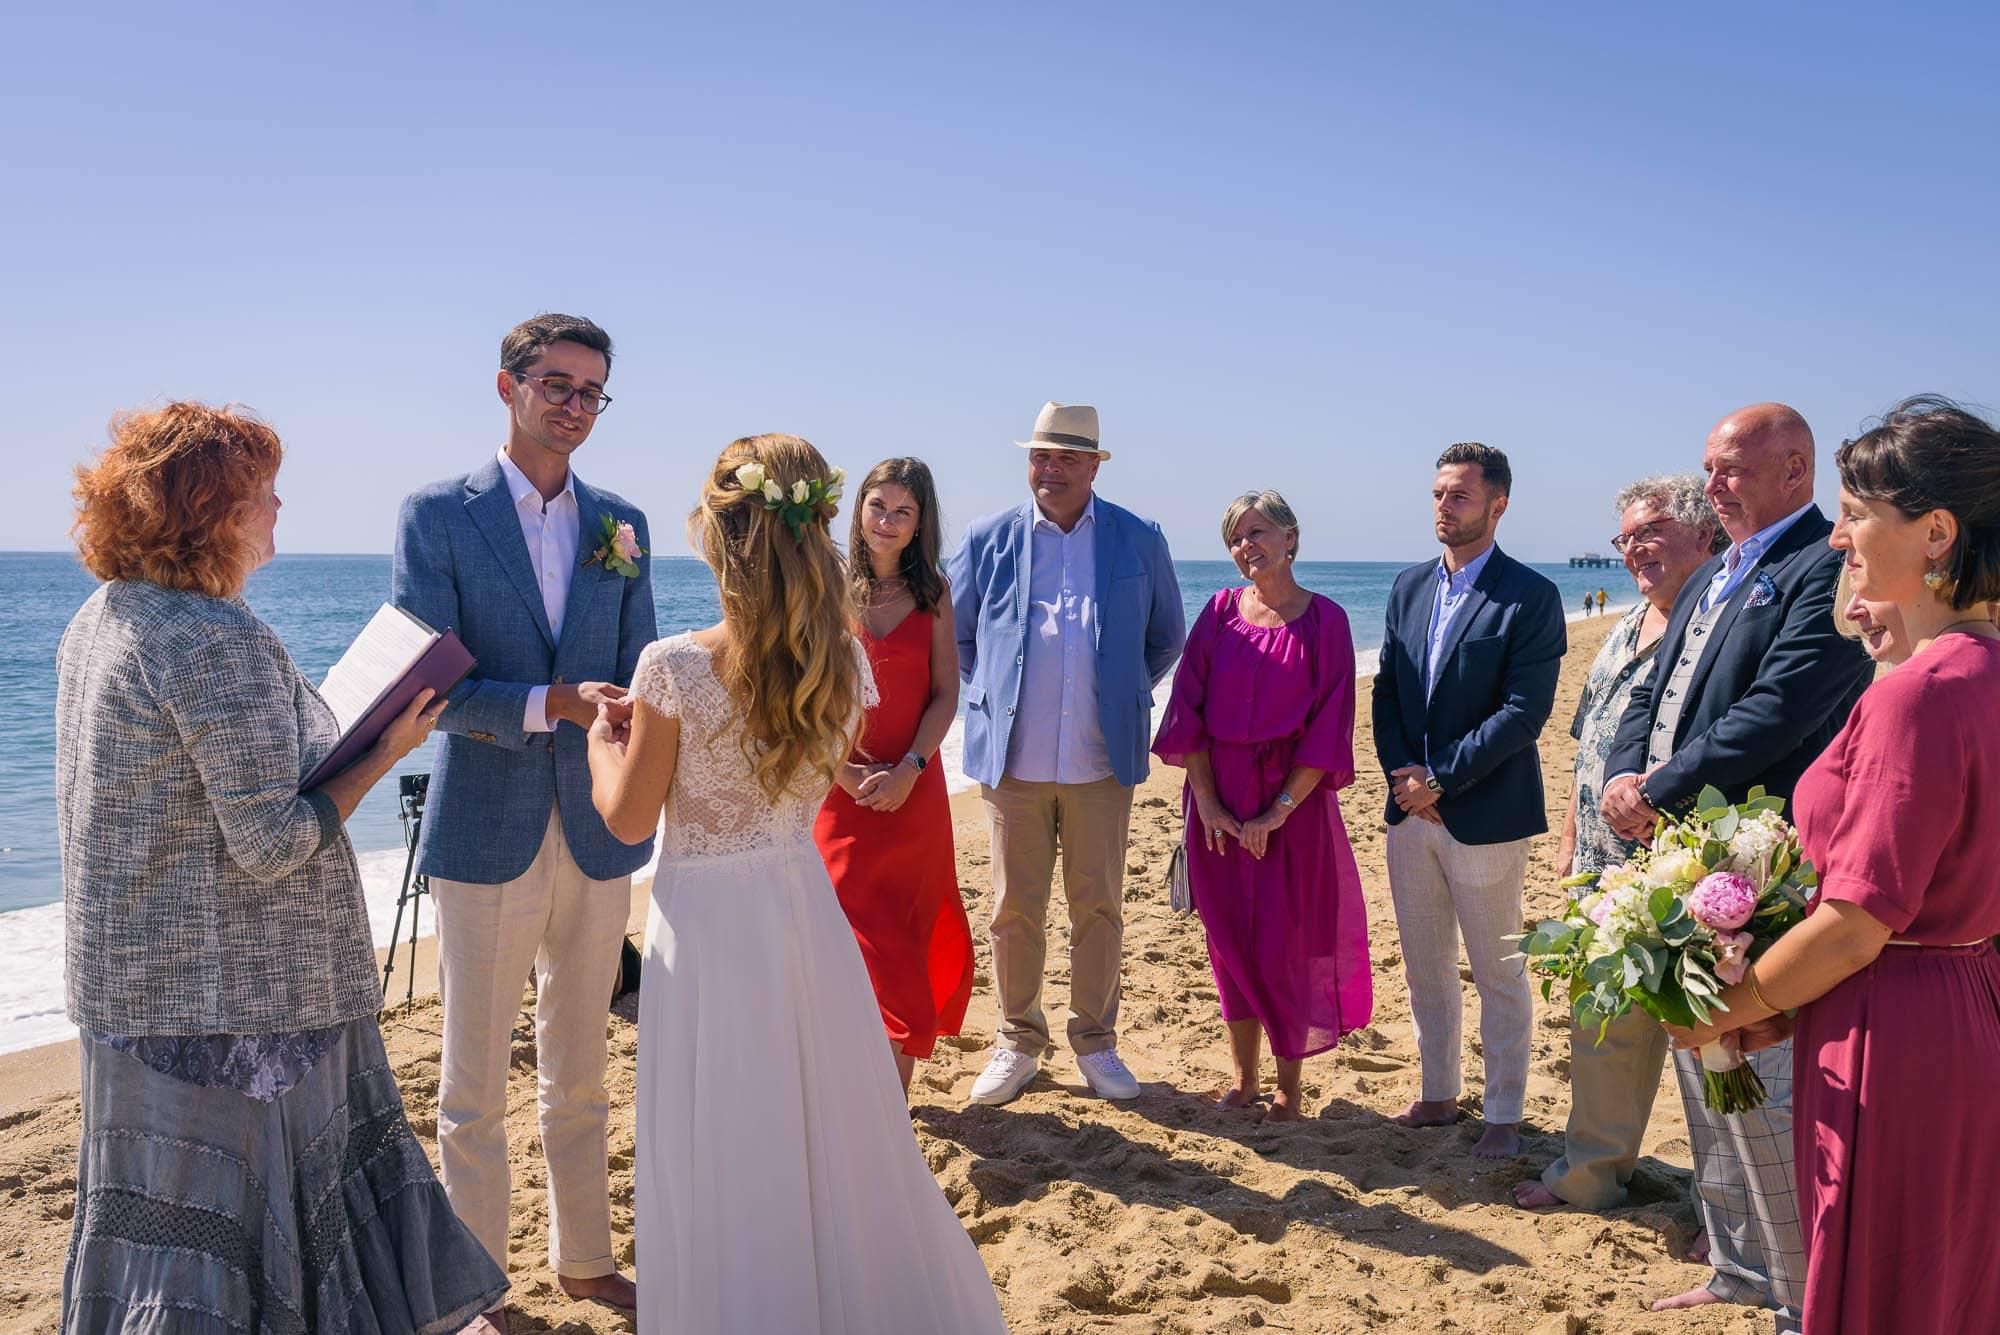 025_Alan_and_Heidi_Wedding_Verena_Andreas